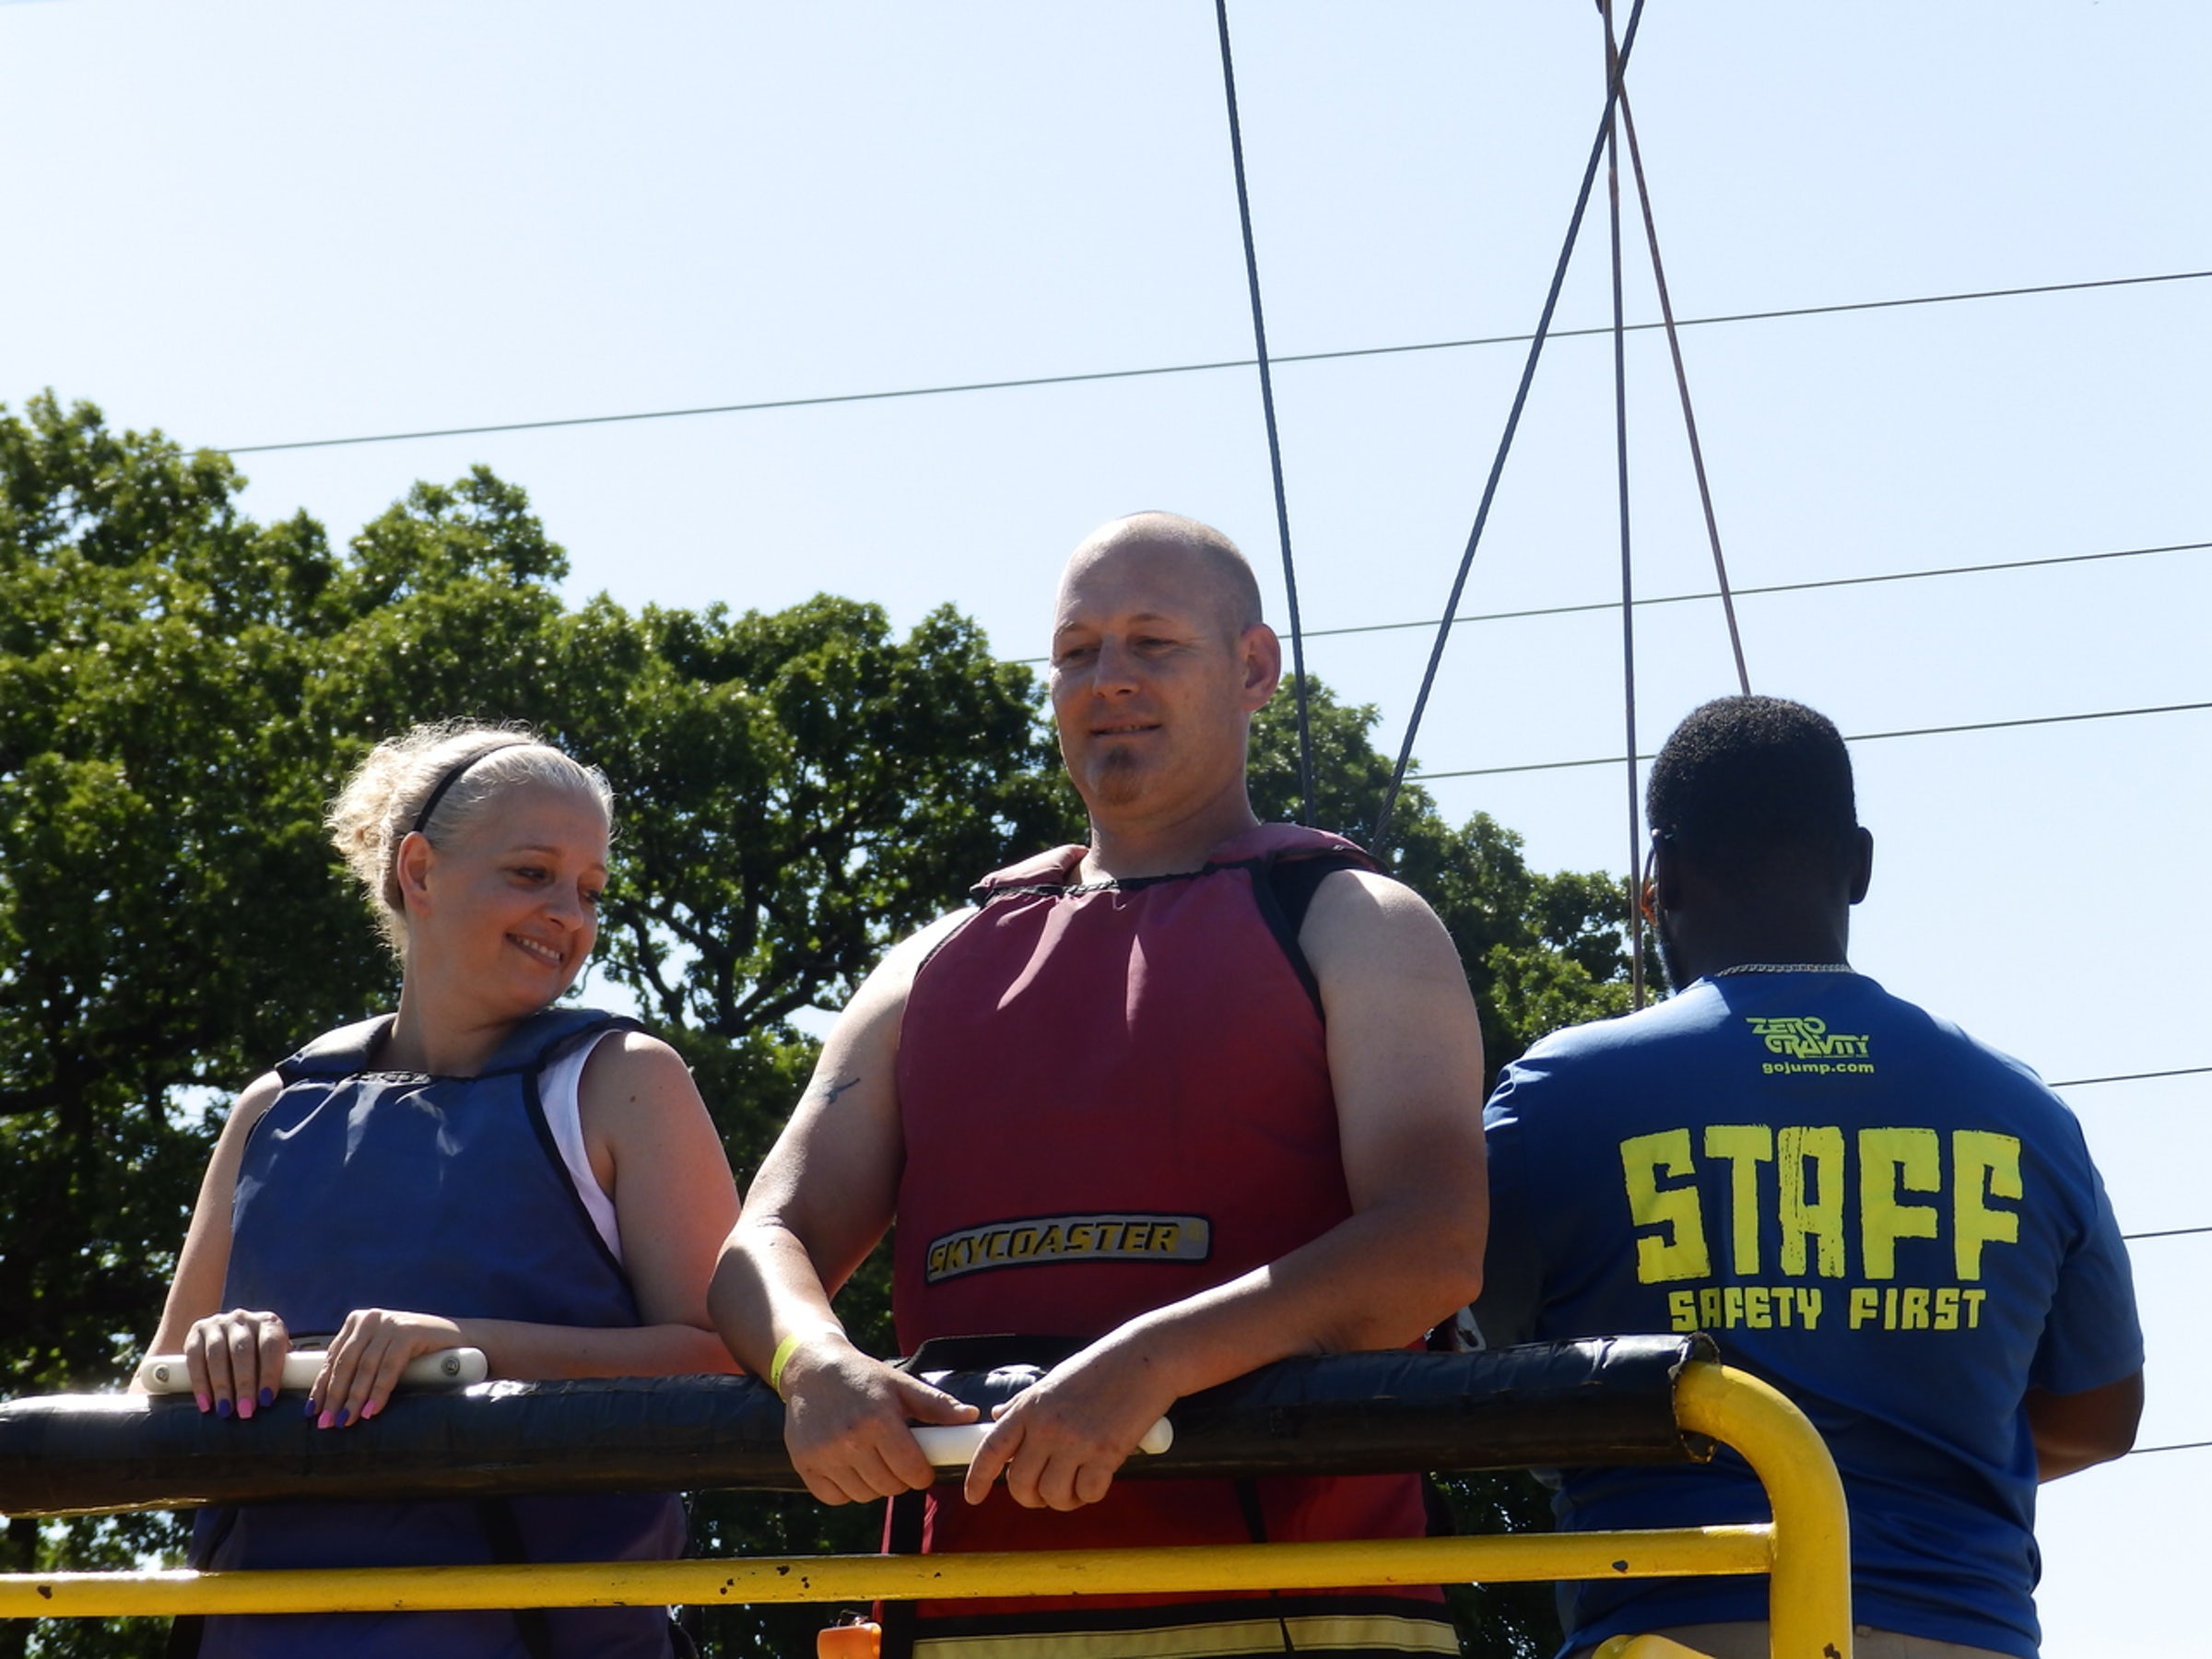 Zero Gravity Thrill Amusement Park in Beyond Dallas